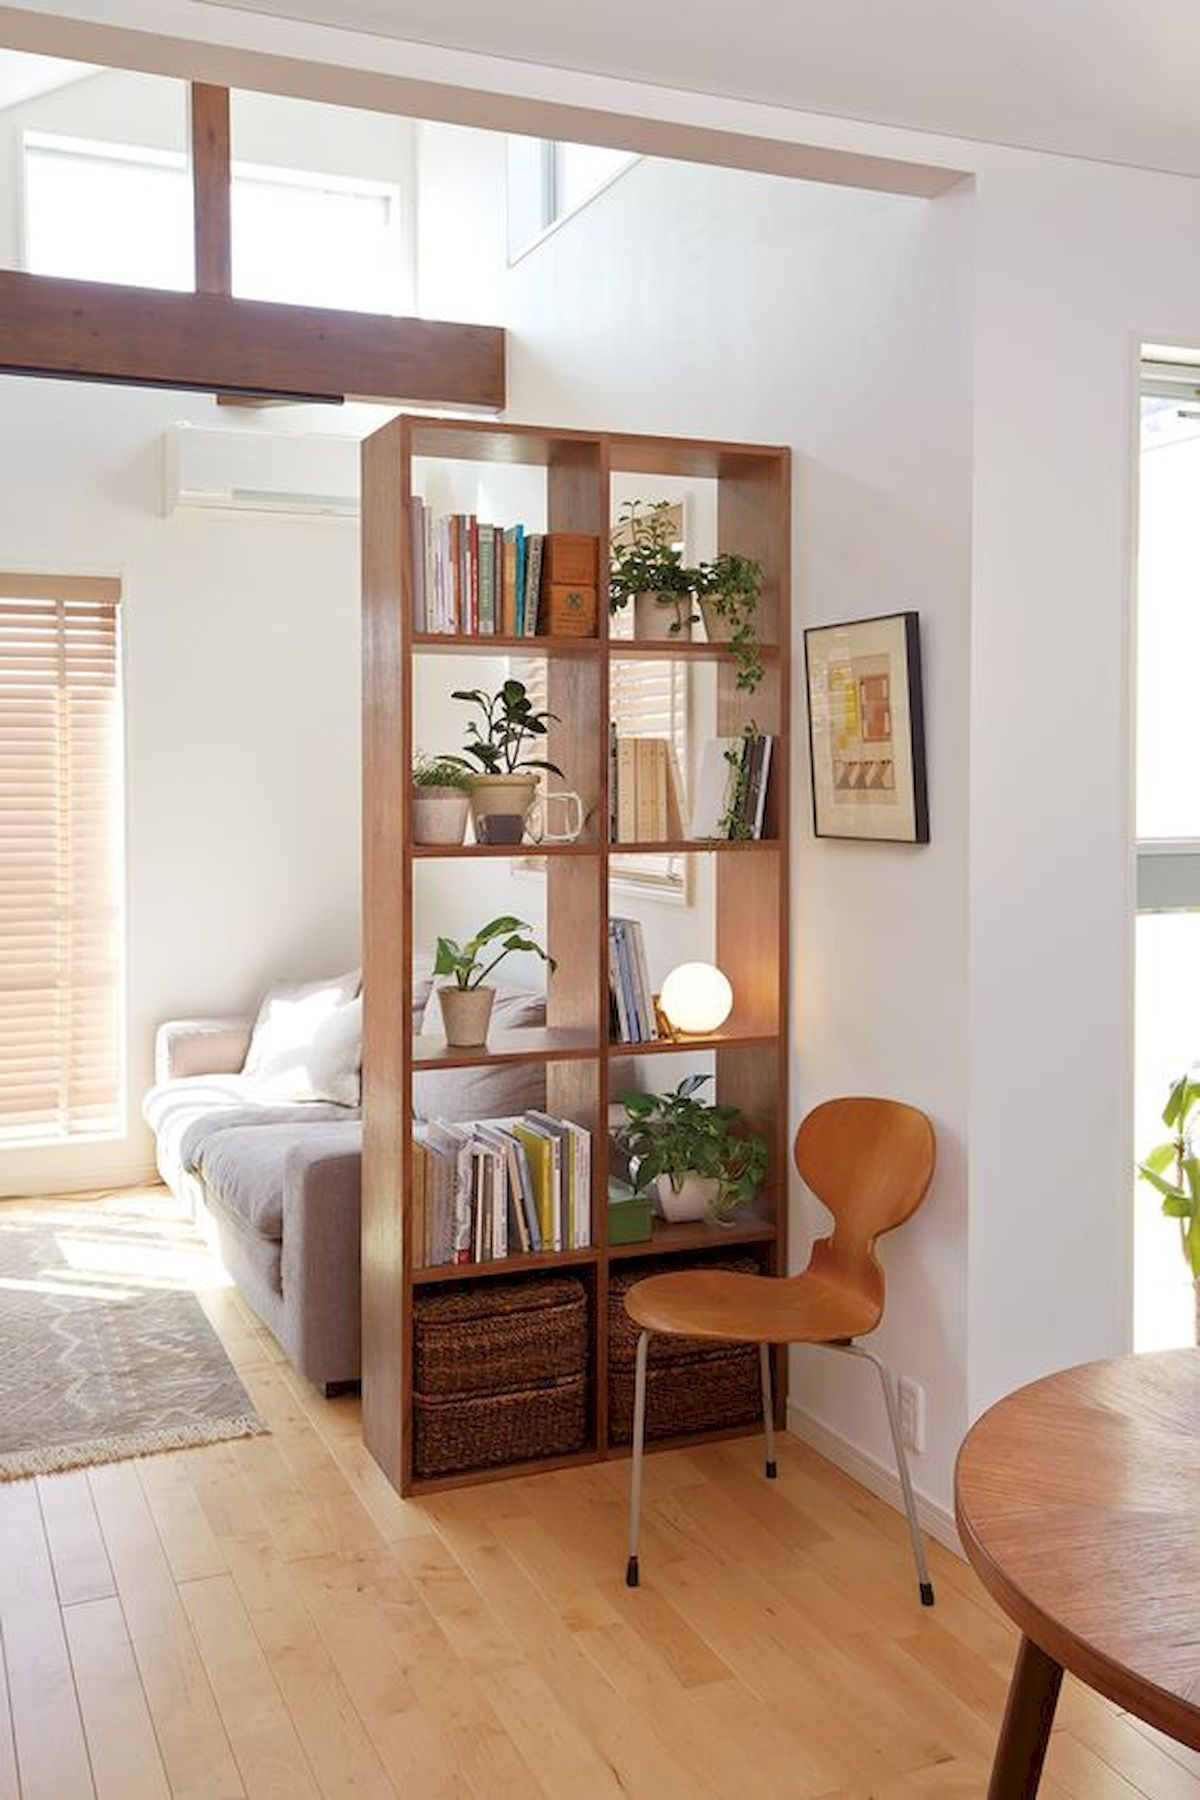 Cool 33 Ideas For Diy Pallet Racks Source Https 33decor Com 33 Ideas For Diy Pallet Racks In 2020 House Interior Home Decor Apartment Decor